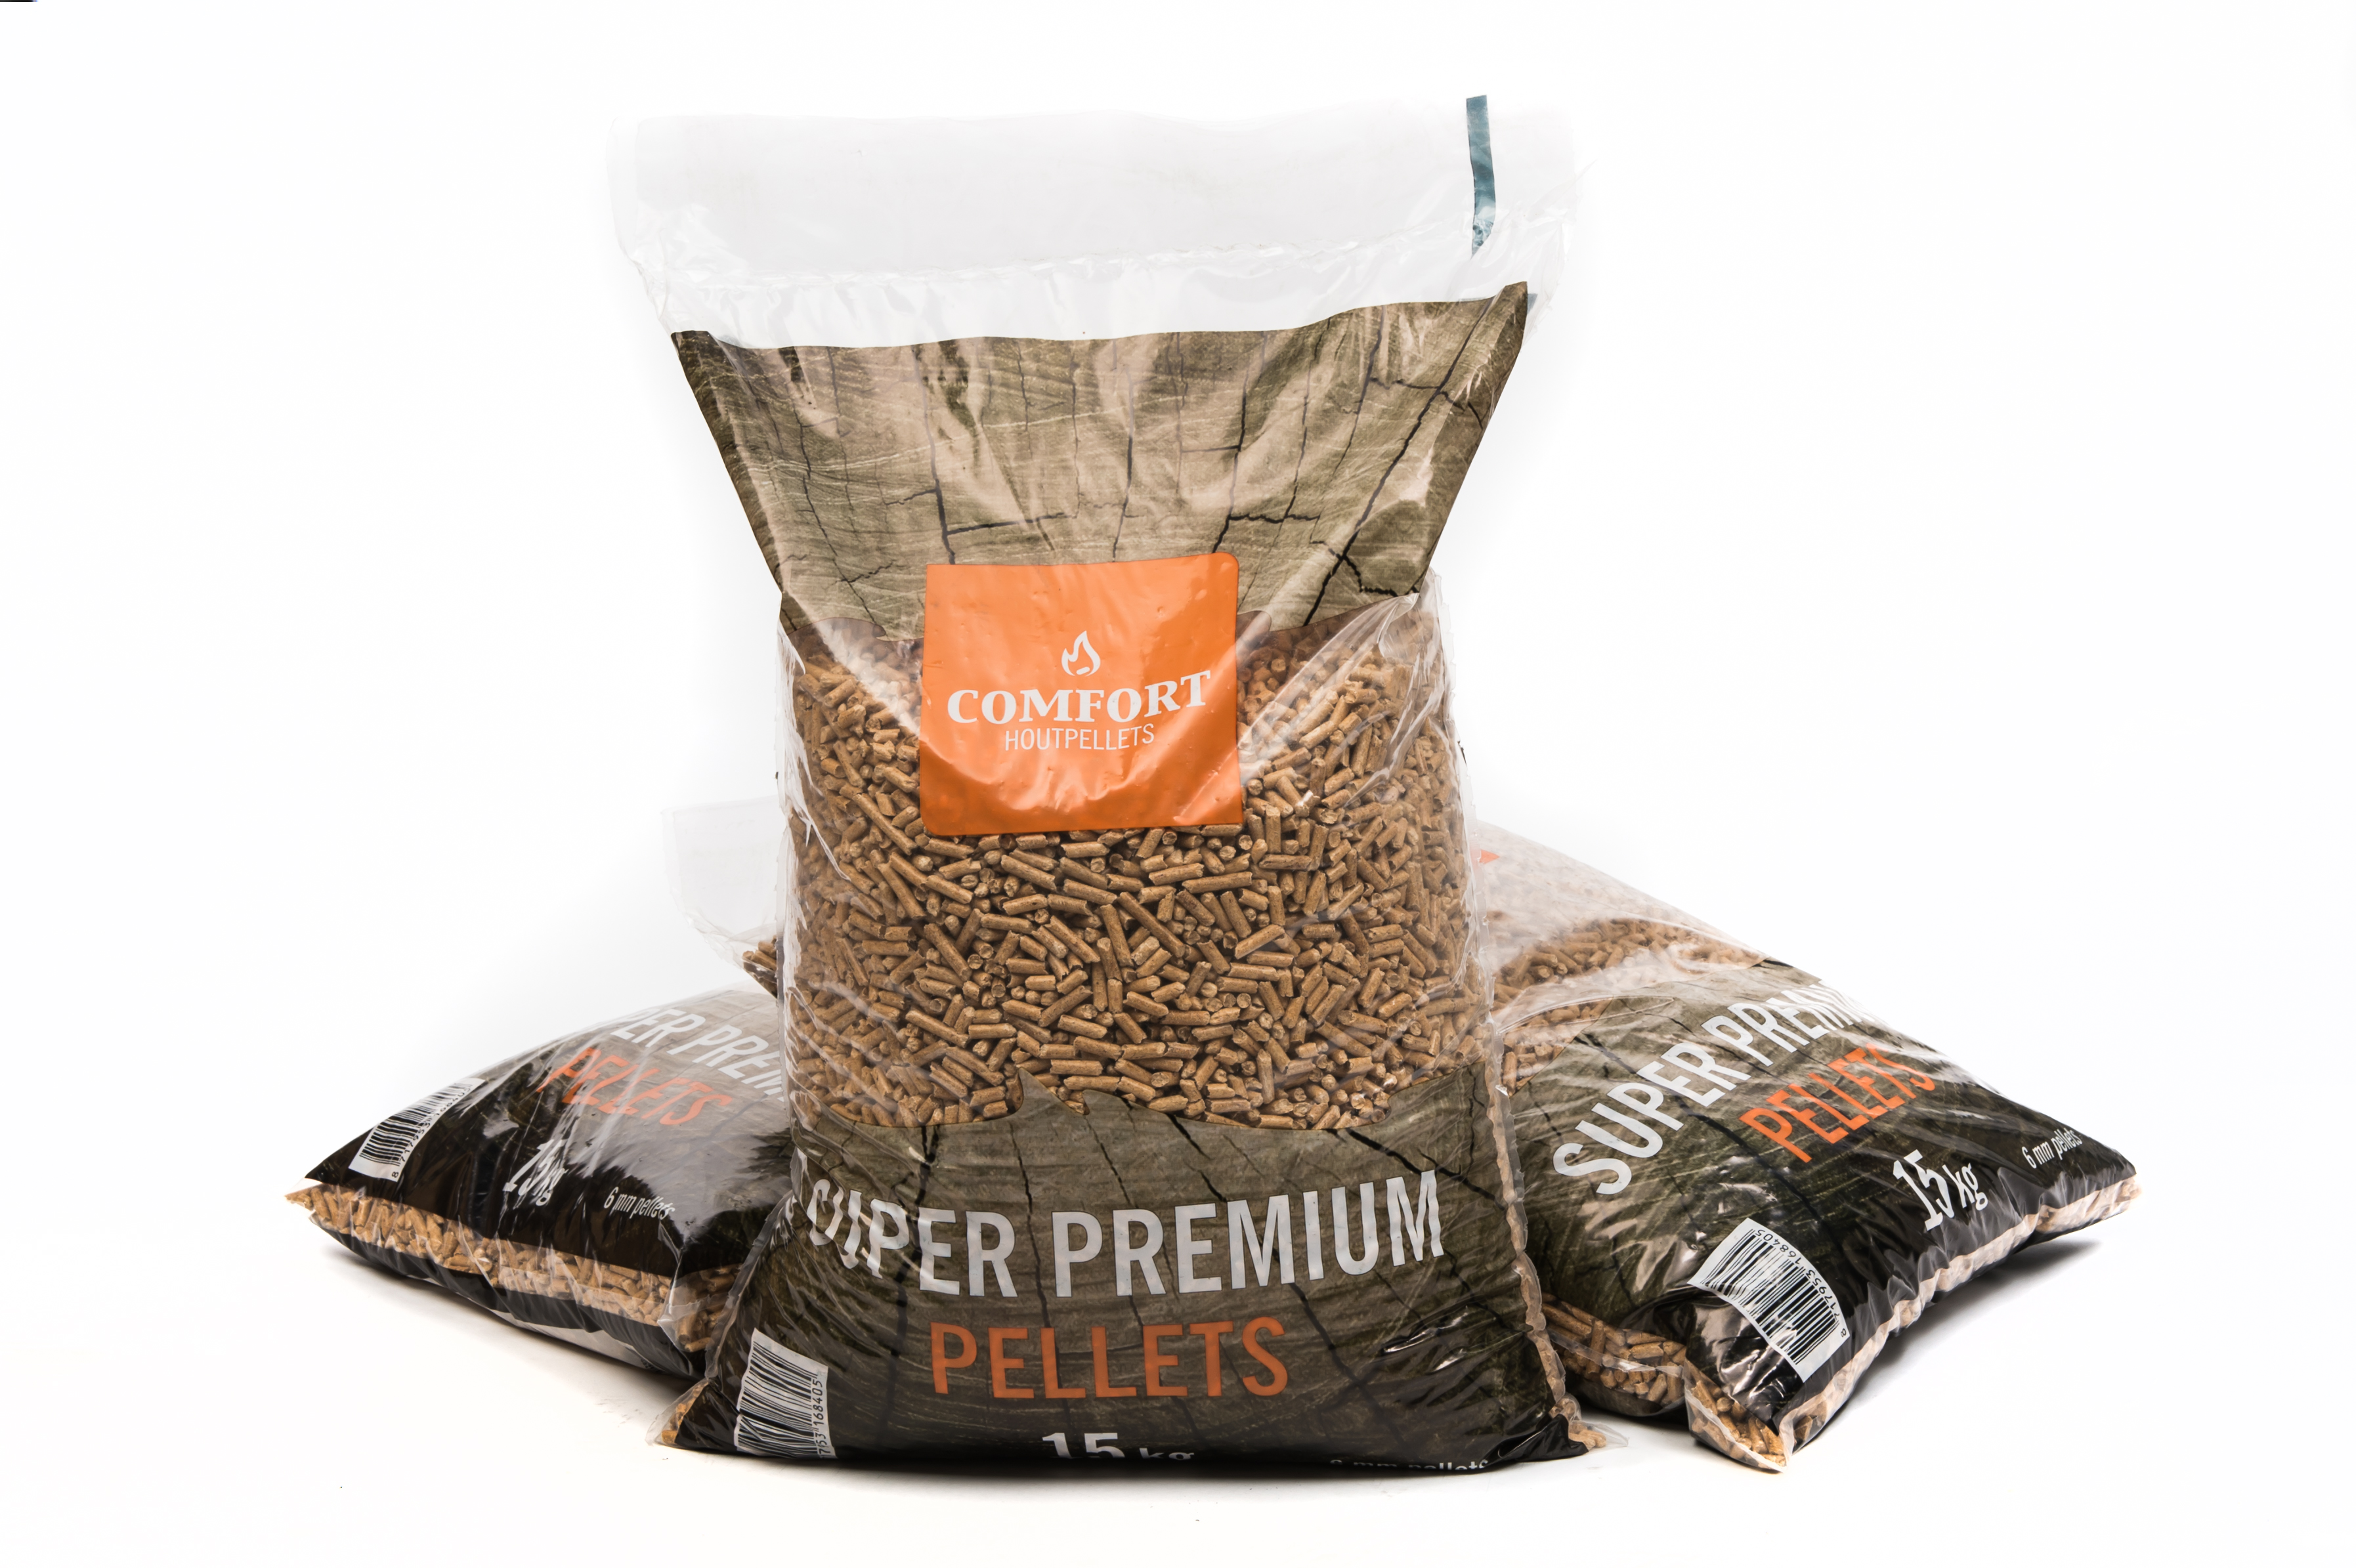 Comfort pellets